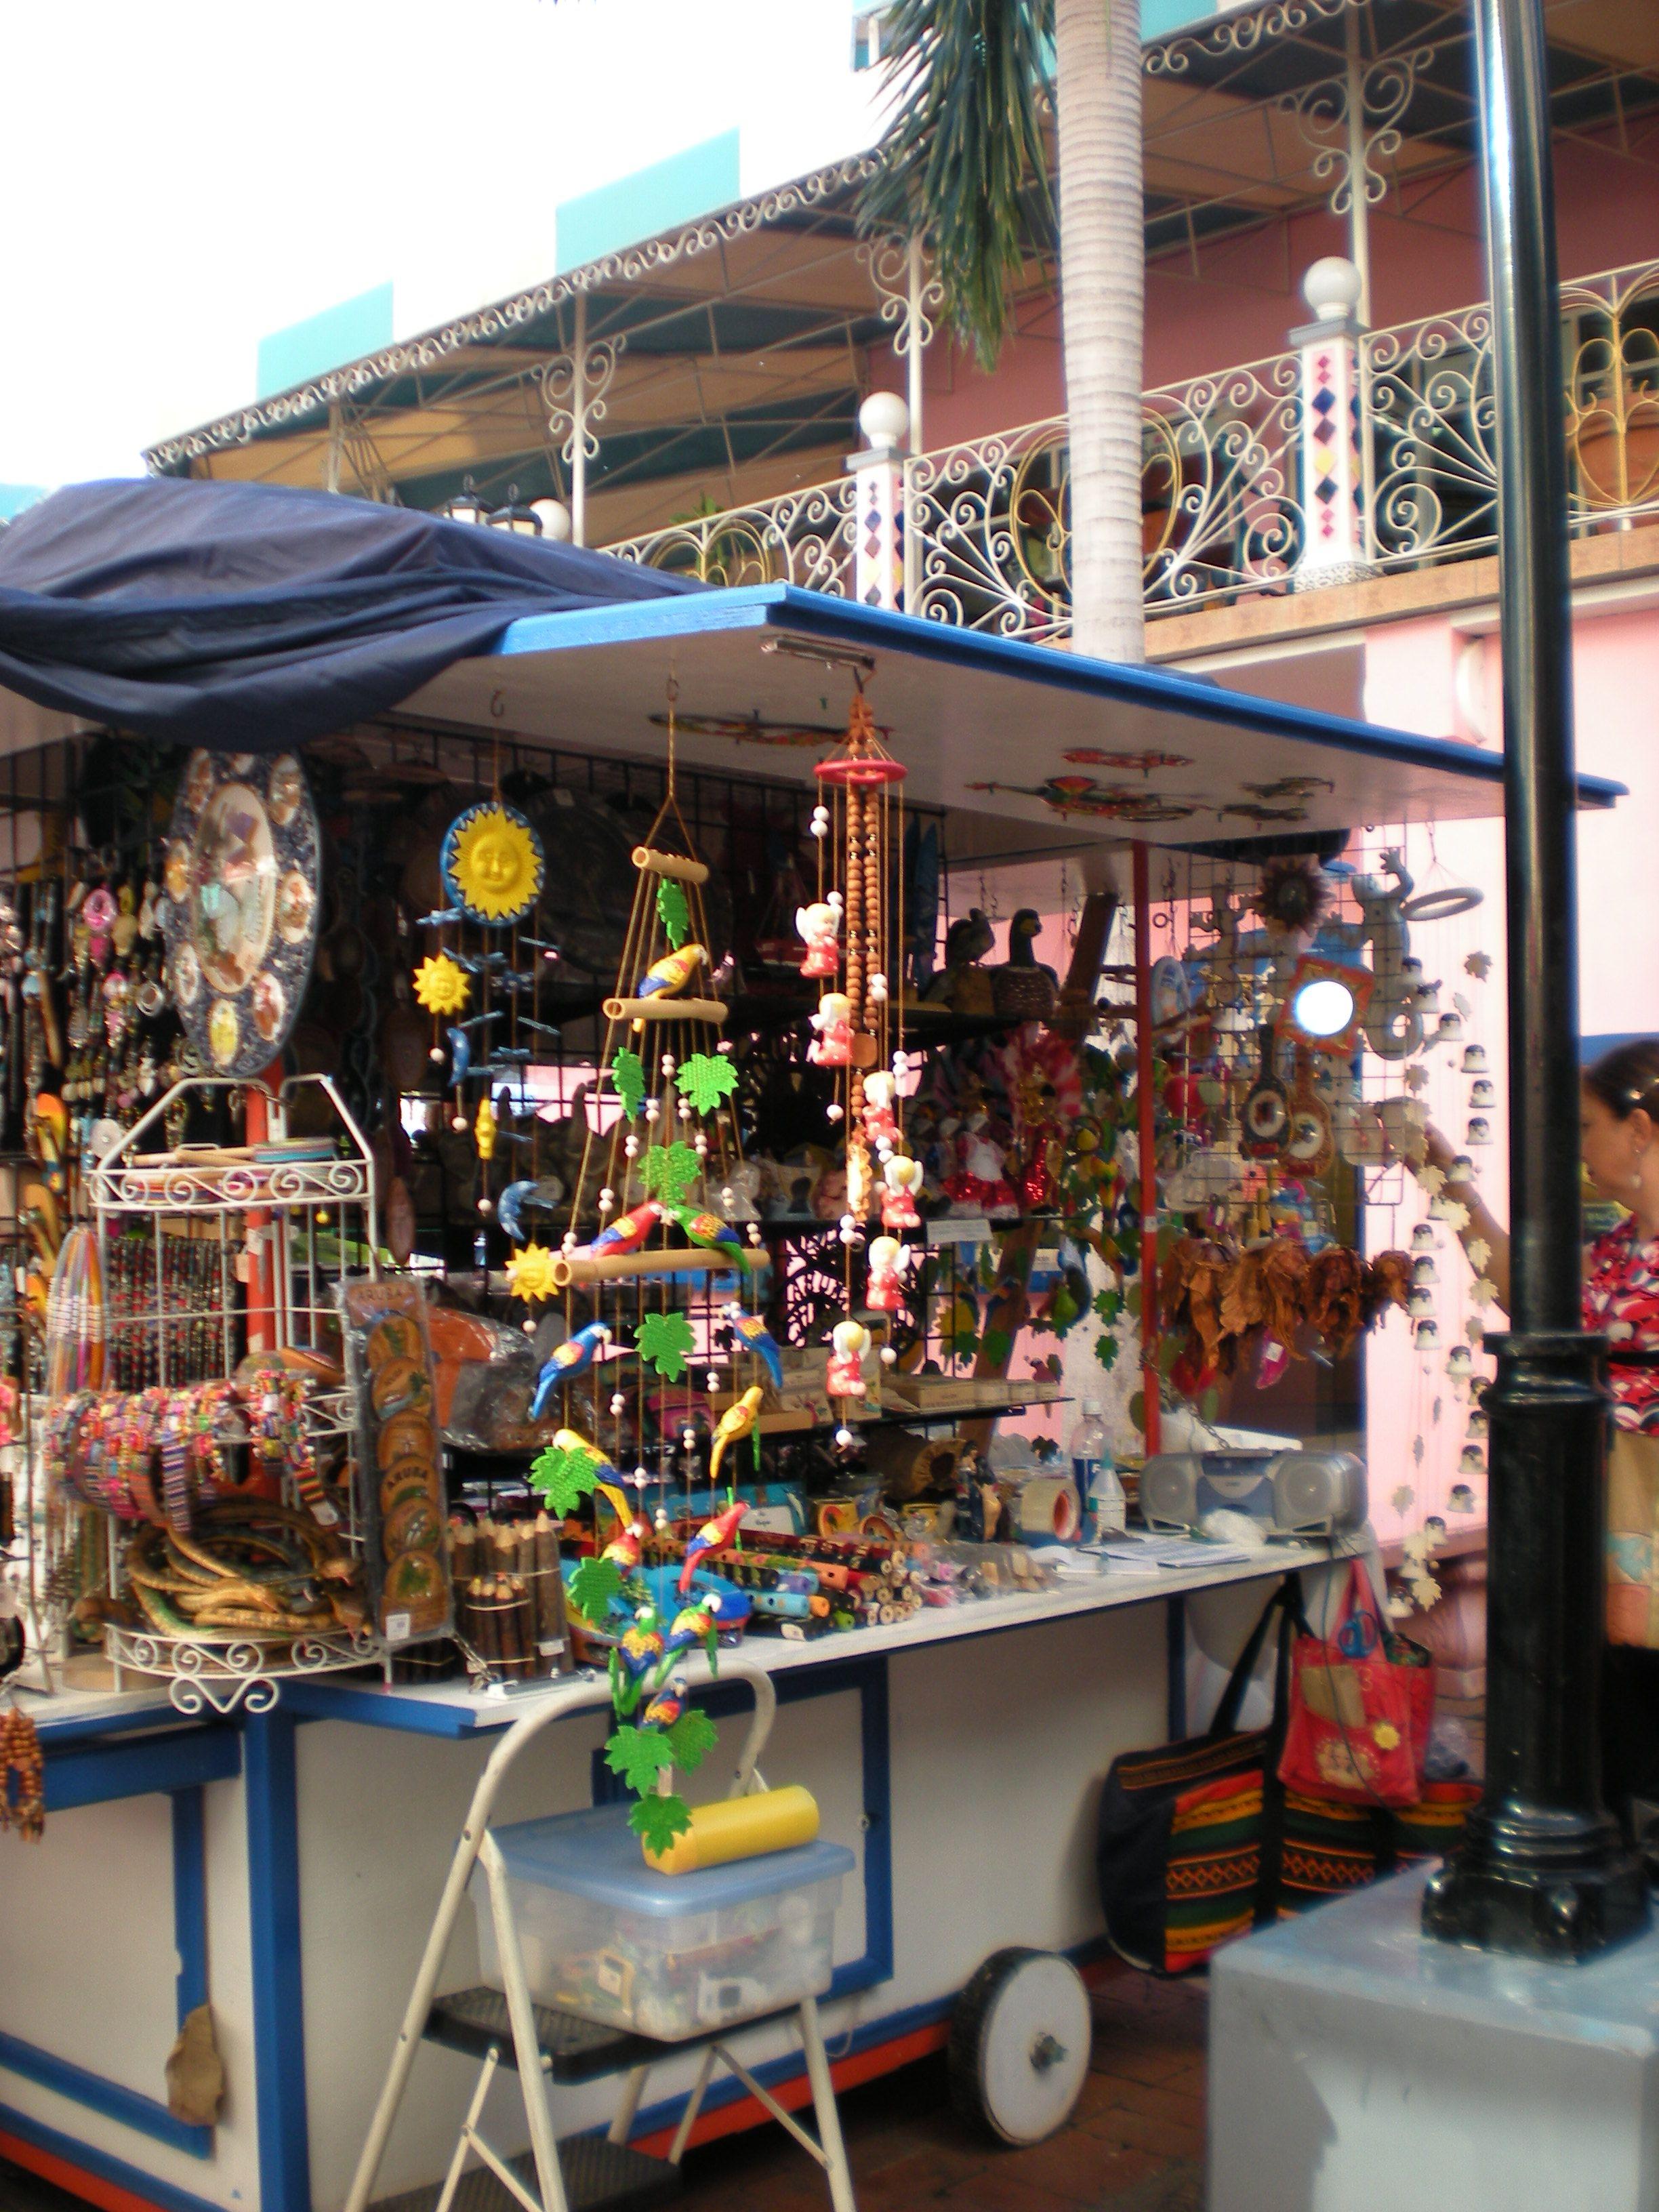 One of the many gift shops downtown Oranjestad  #Aruba